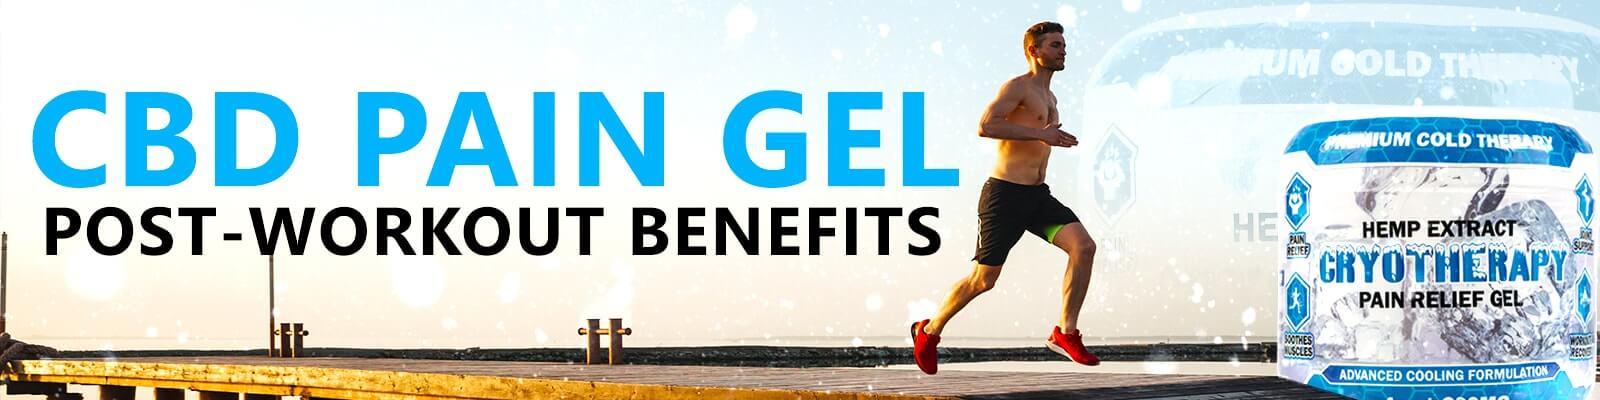 CBD Pain Gel post-workout benefits man running outside